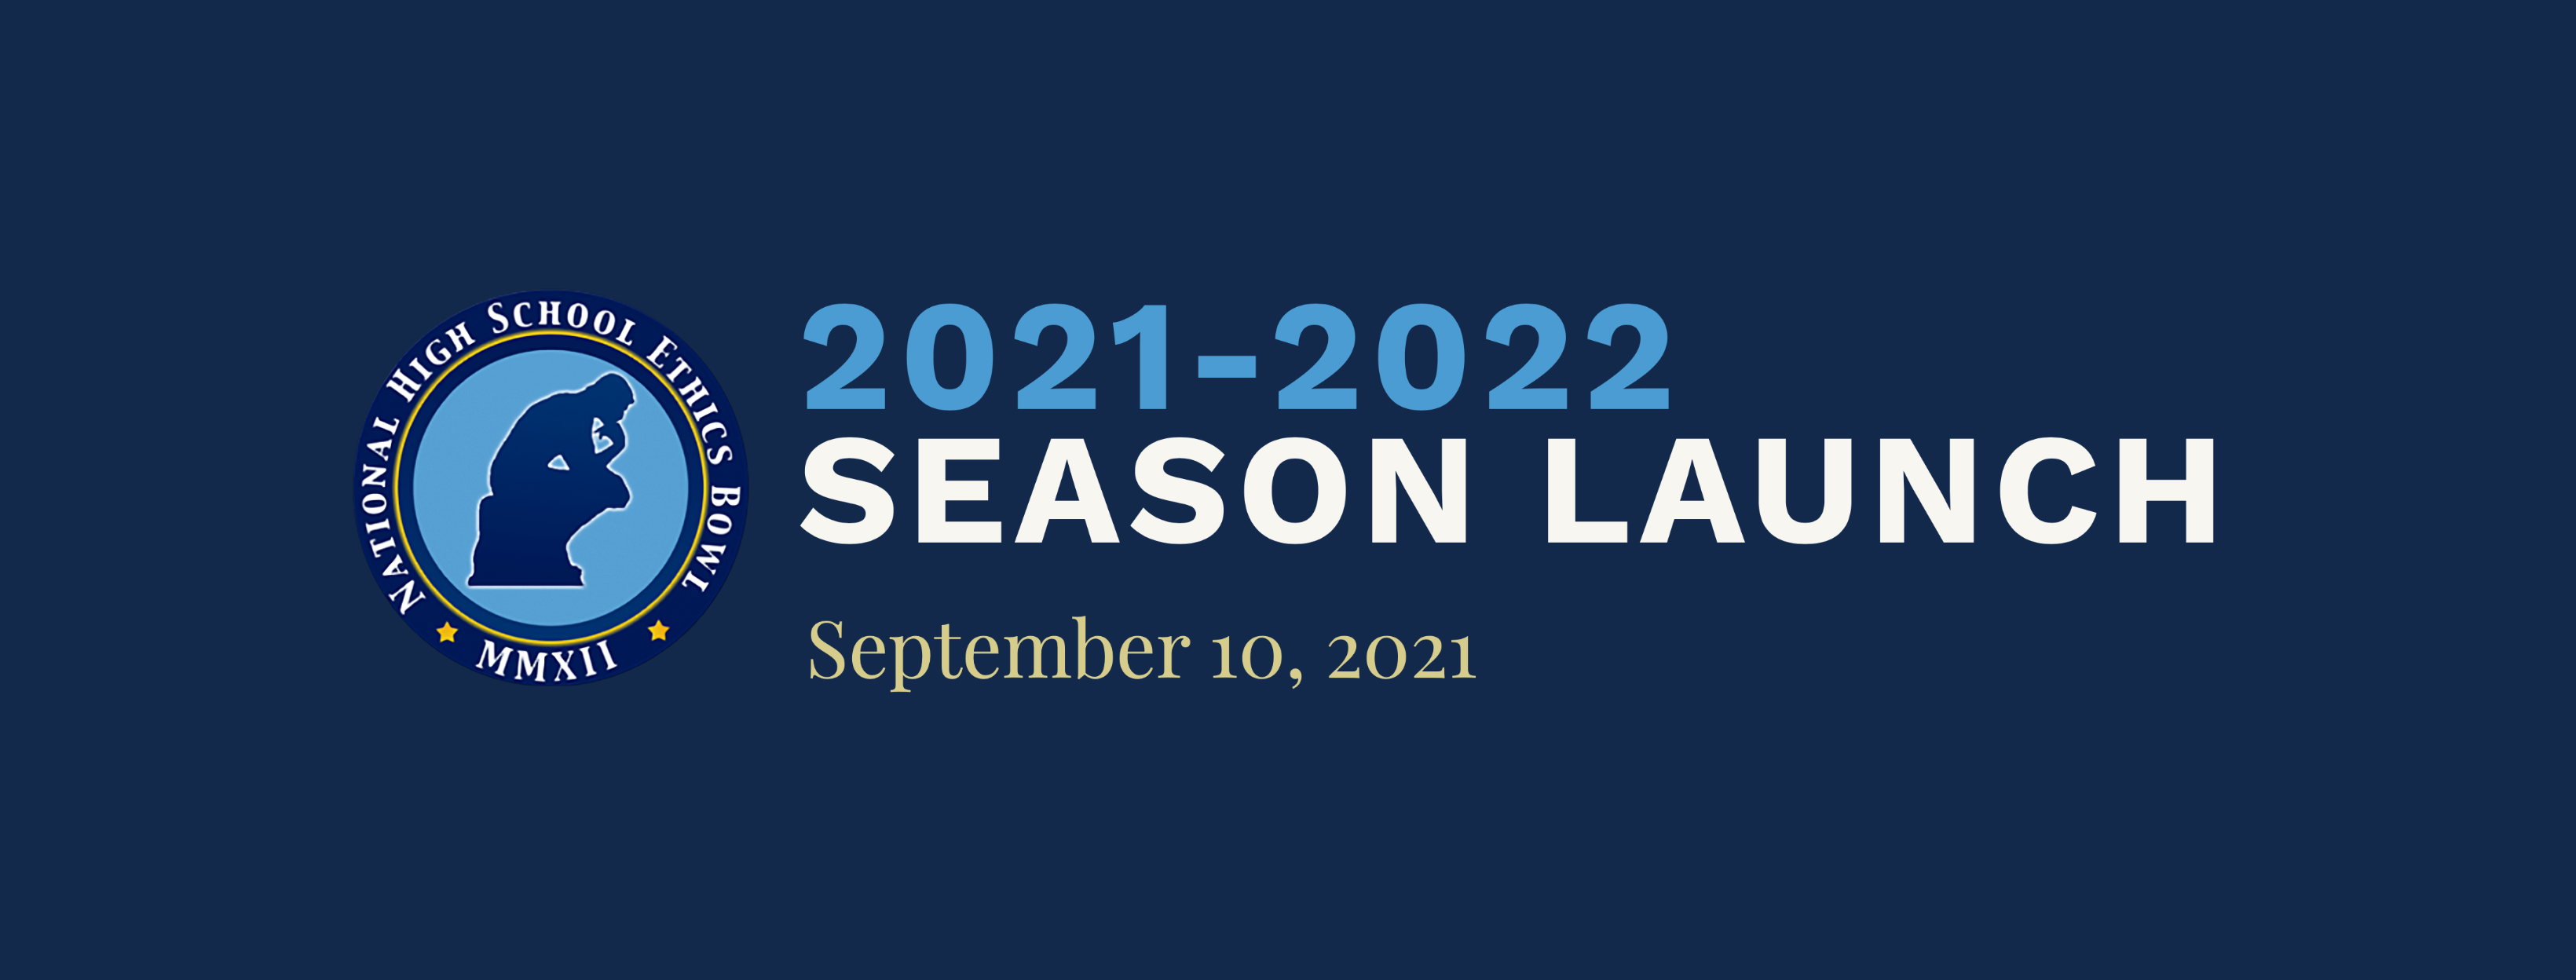 NHSEB 2021-2022 Launch